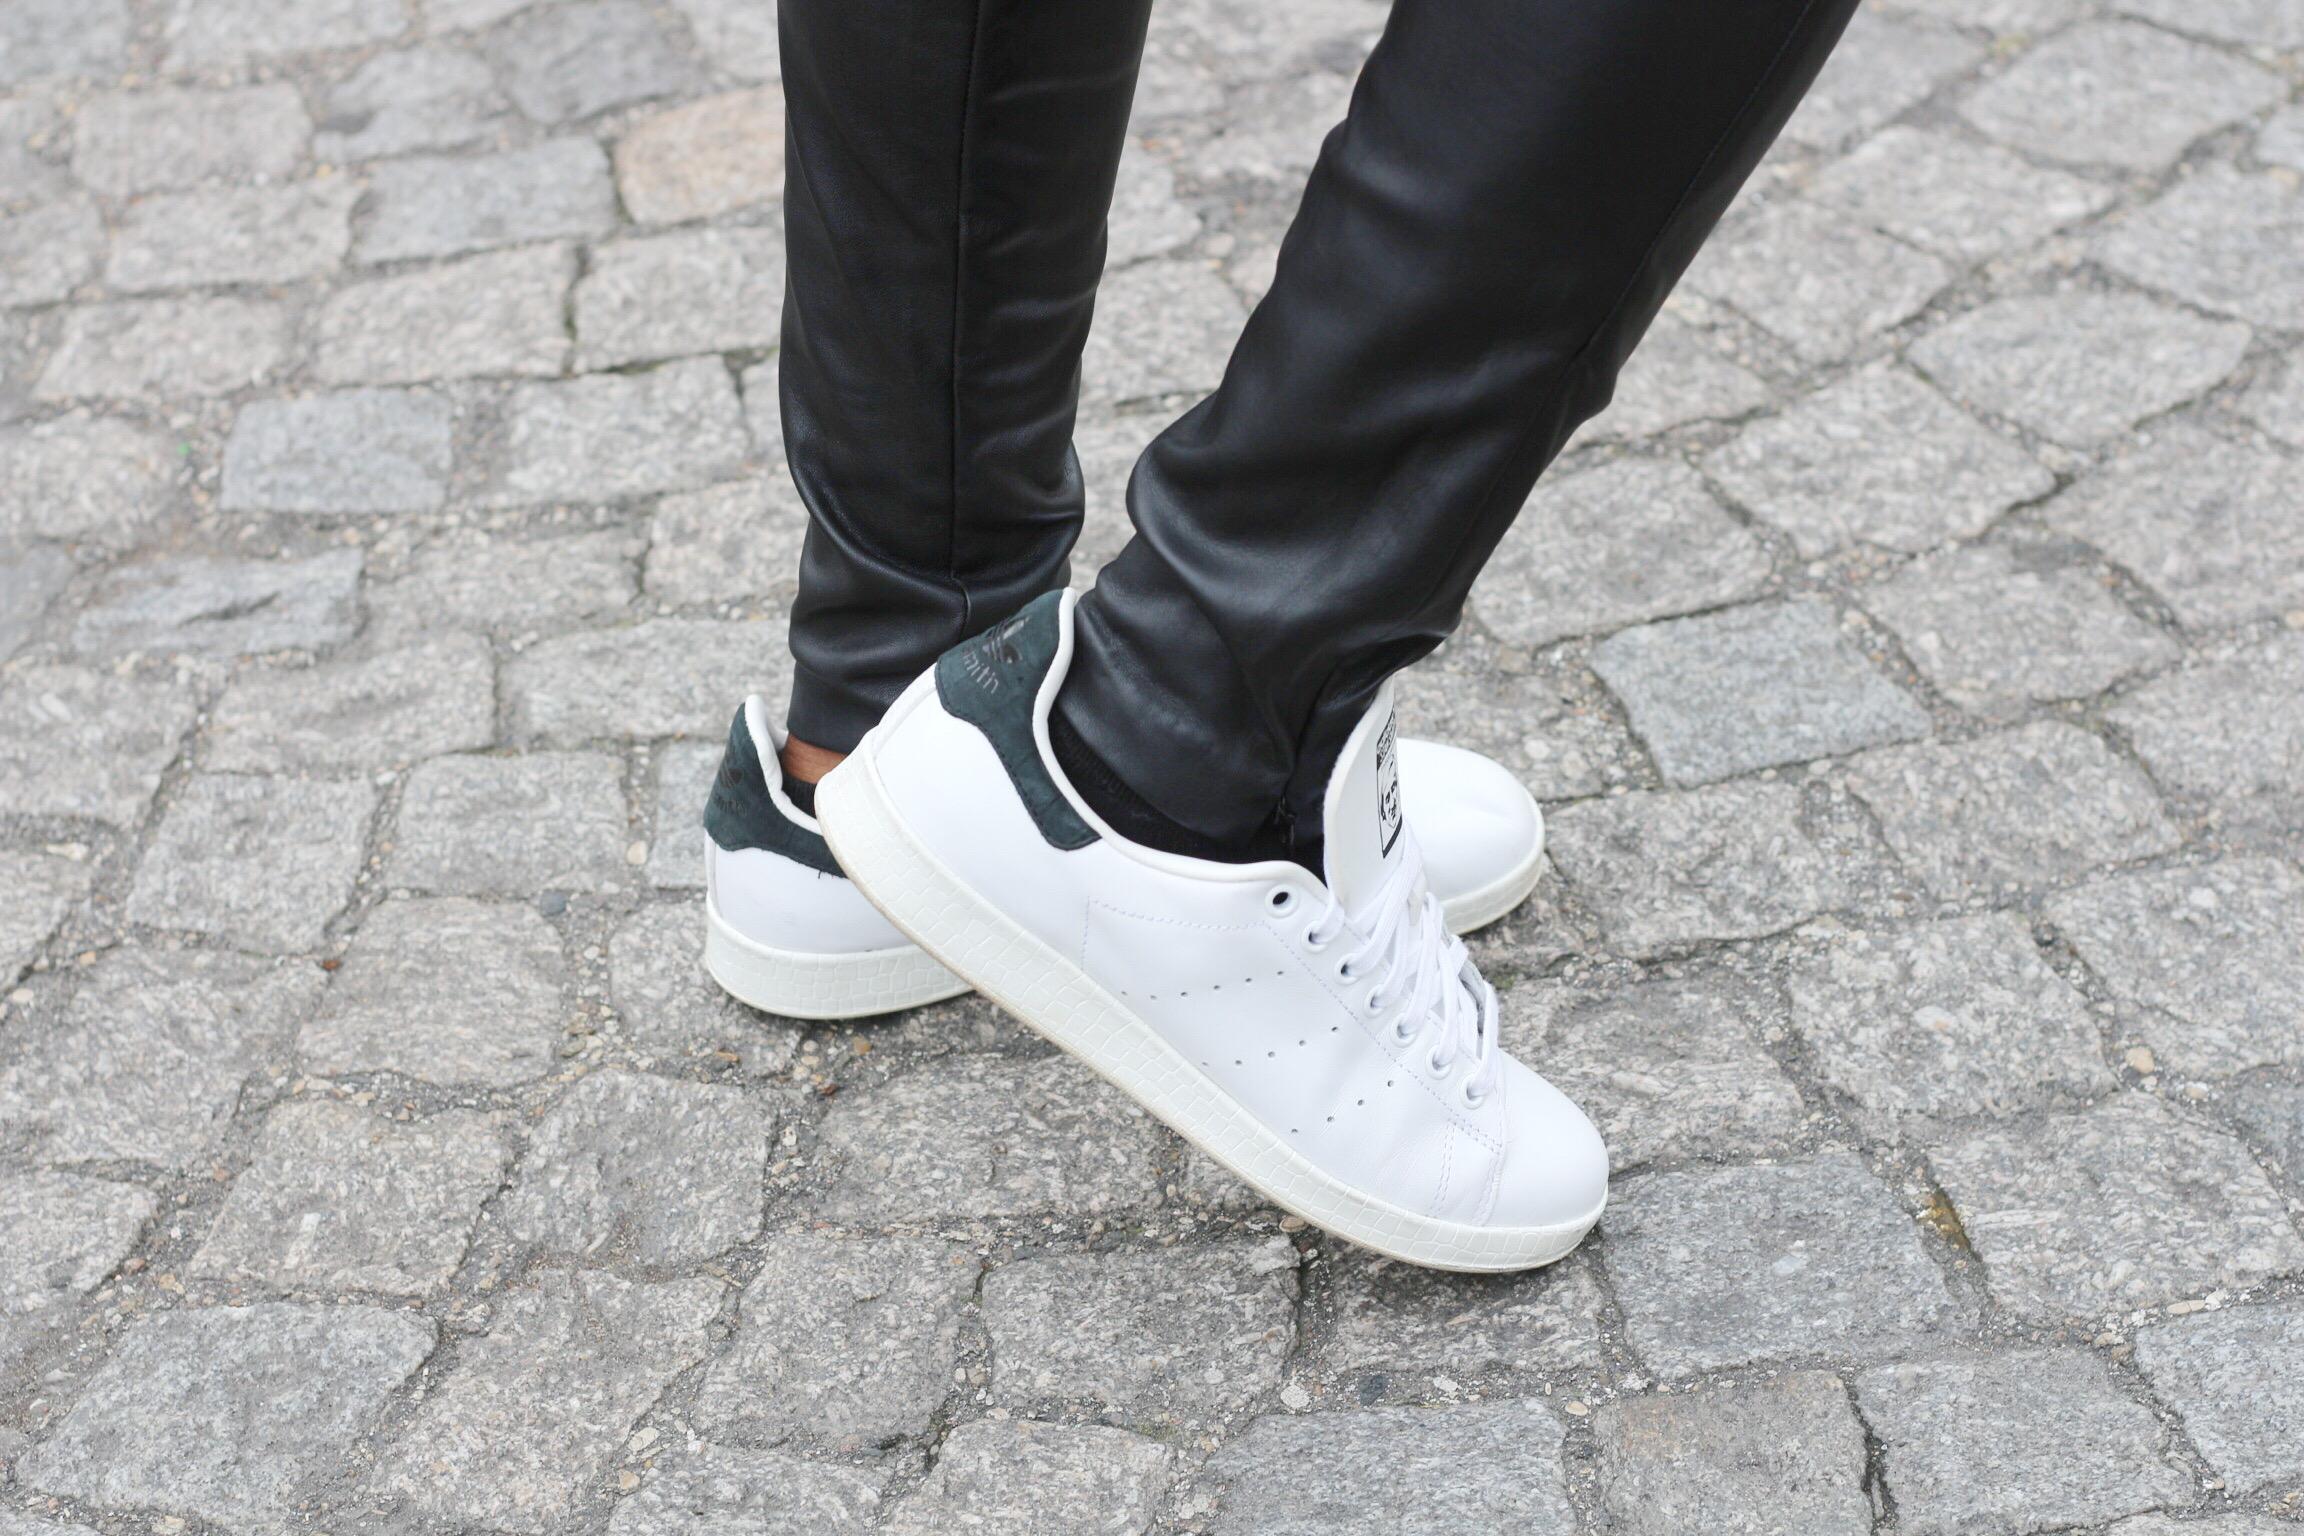 Trysha Gaba - Casual in Adidas 10